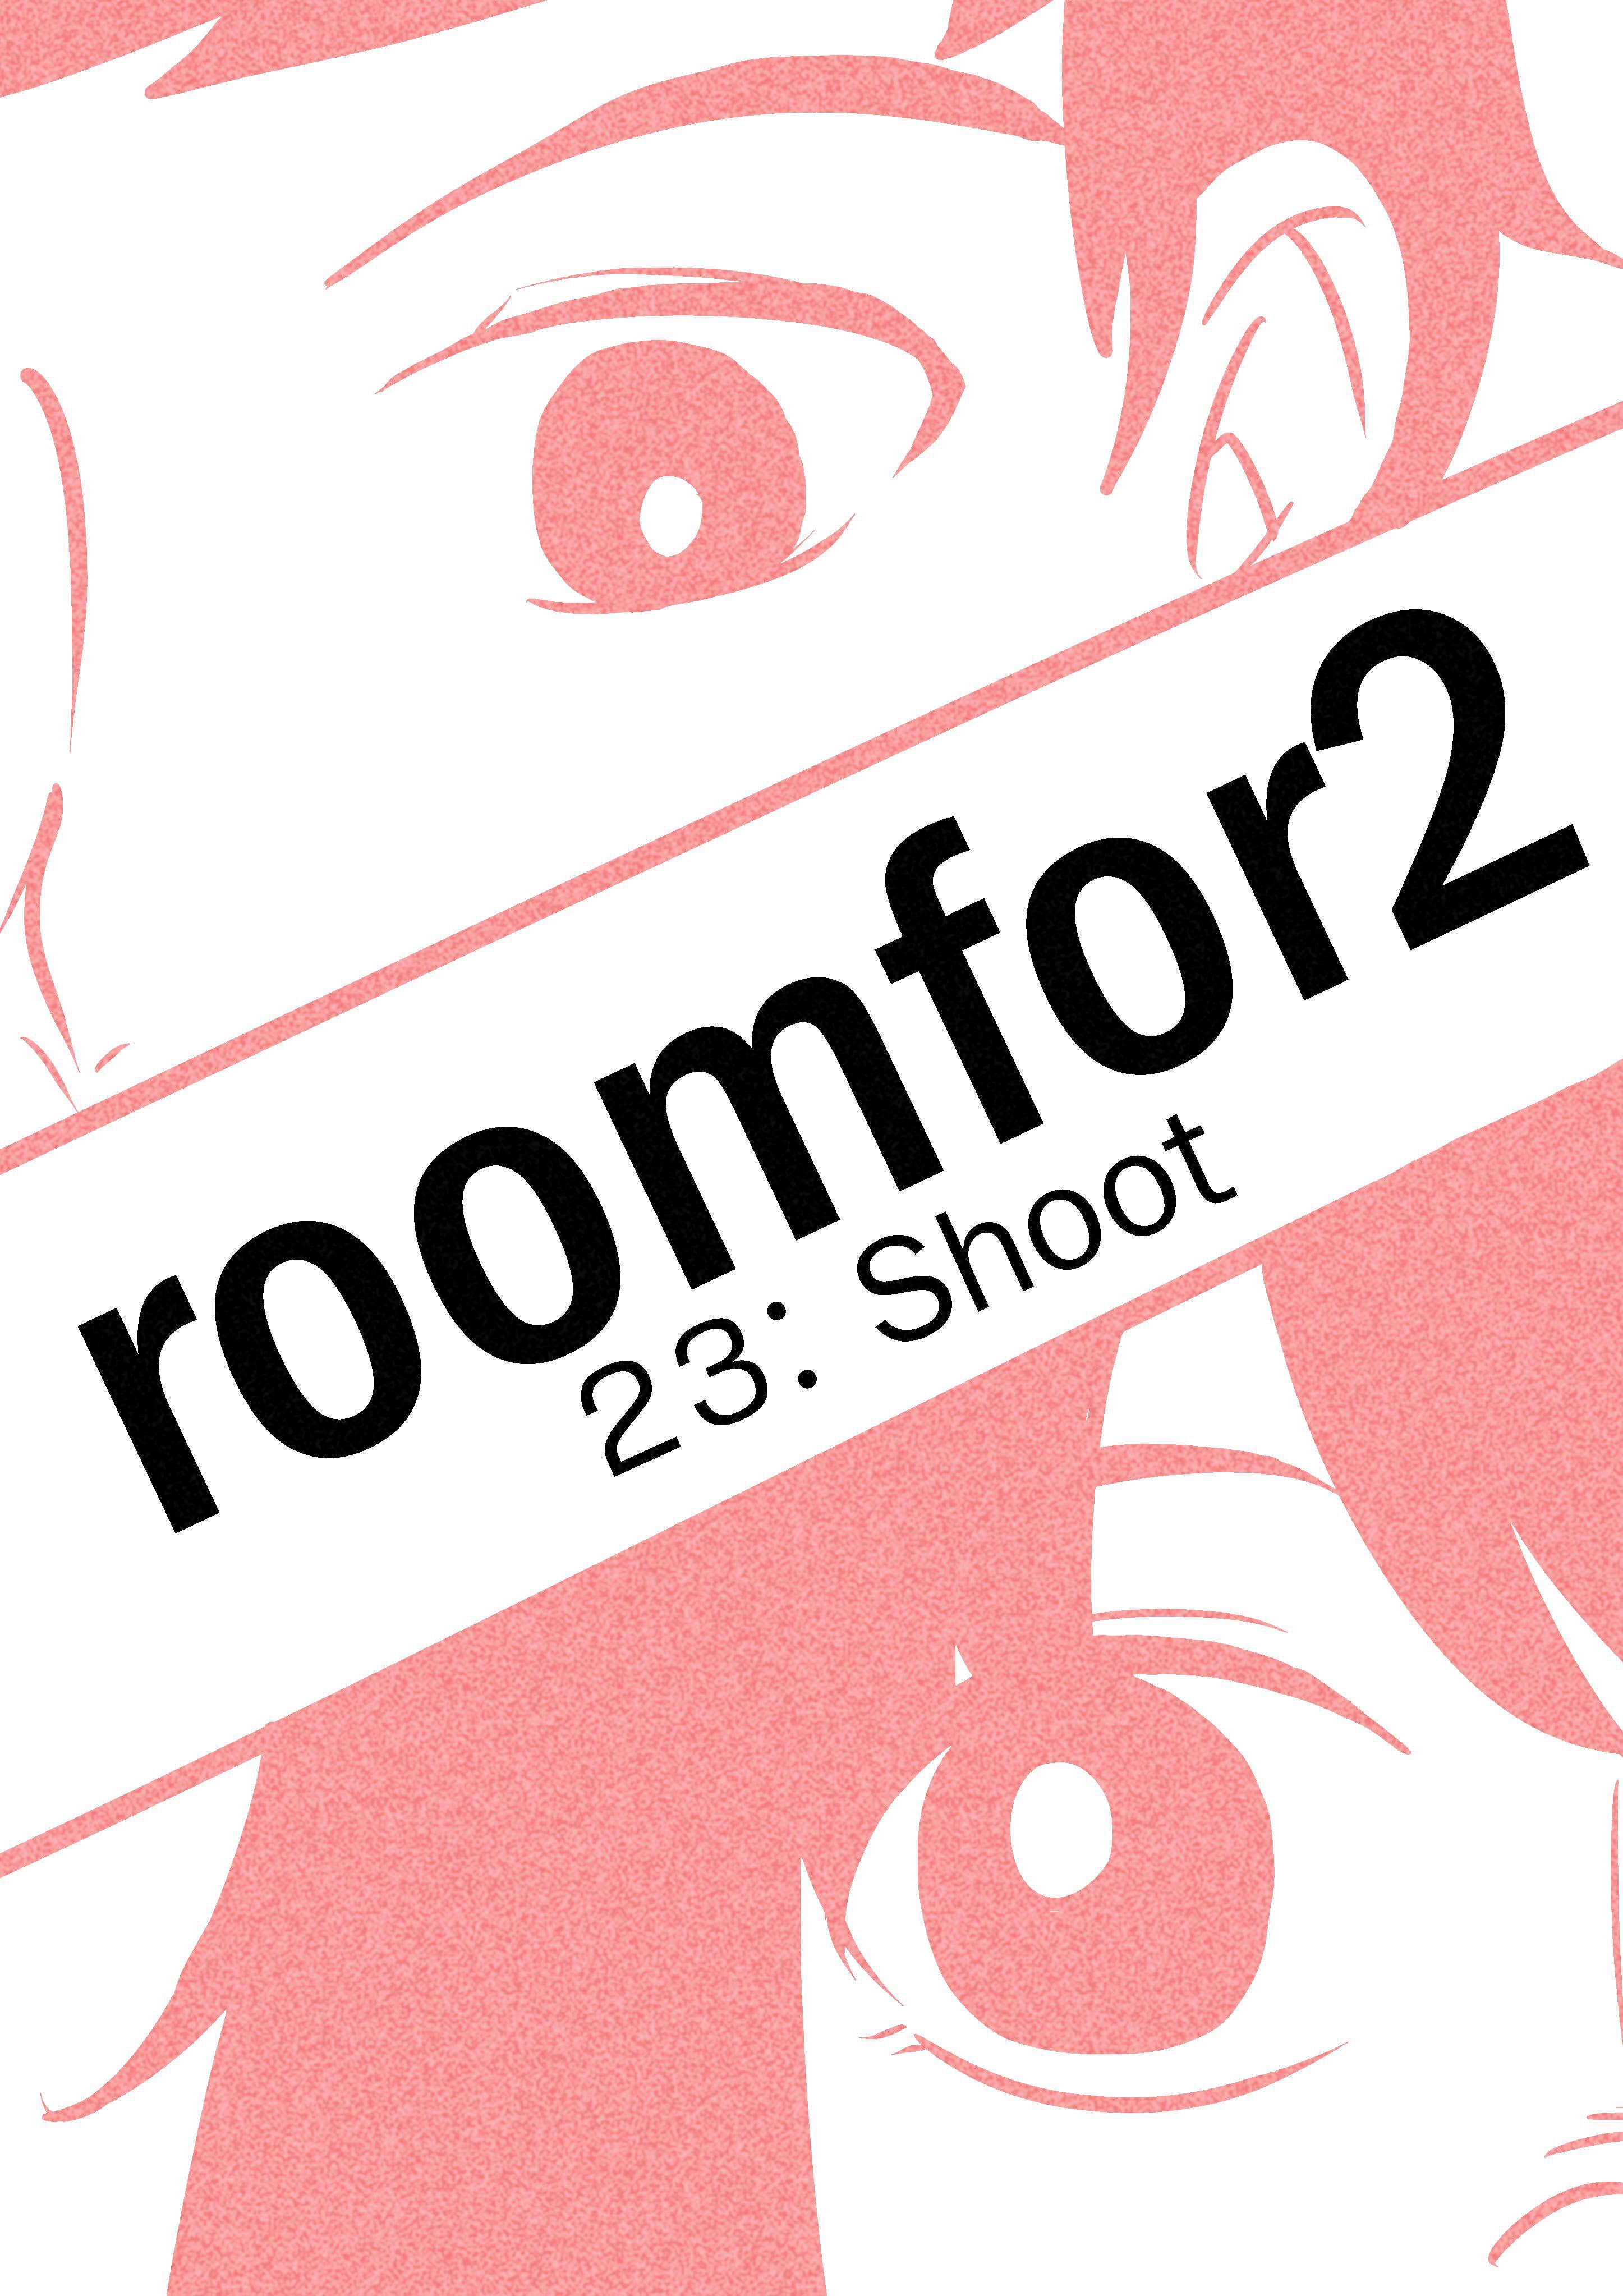 23: Shoot